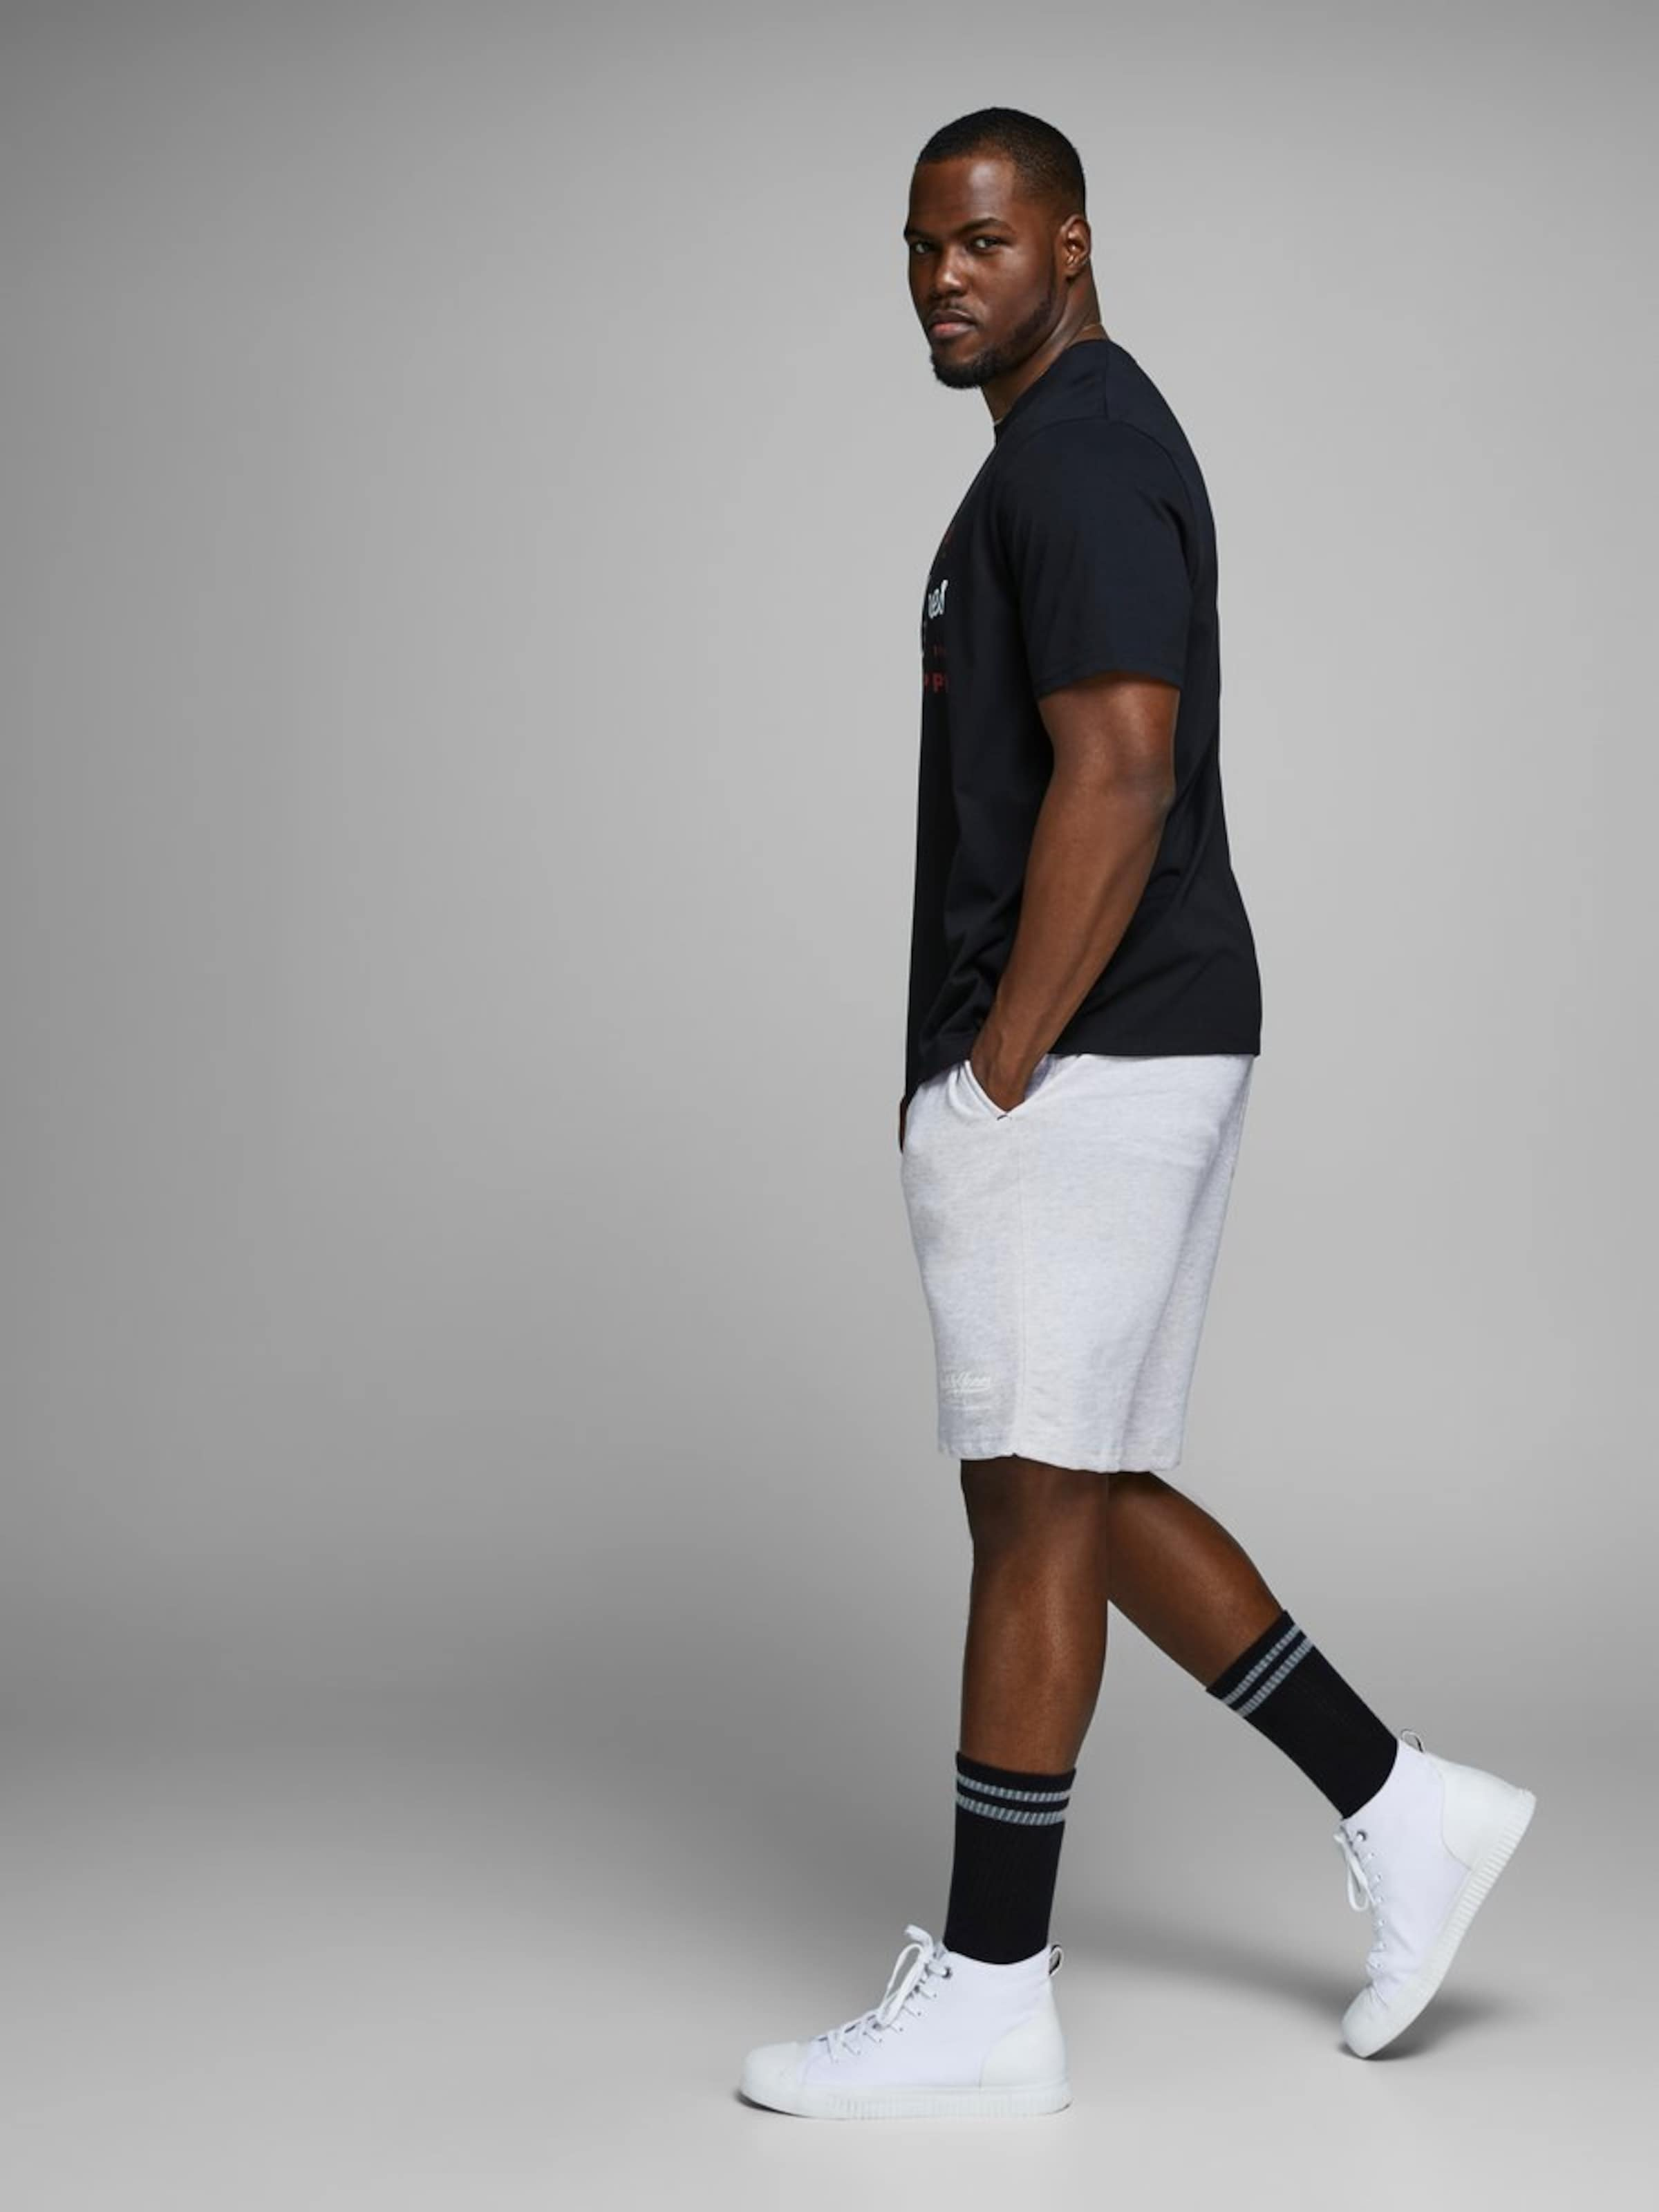 Jackamp; Hellgrau Jackamp; In Shorts Jones hQrdCxts